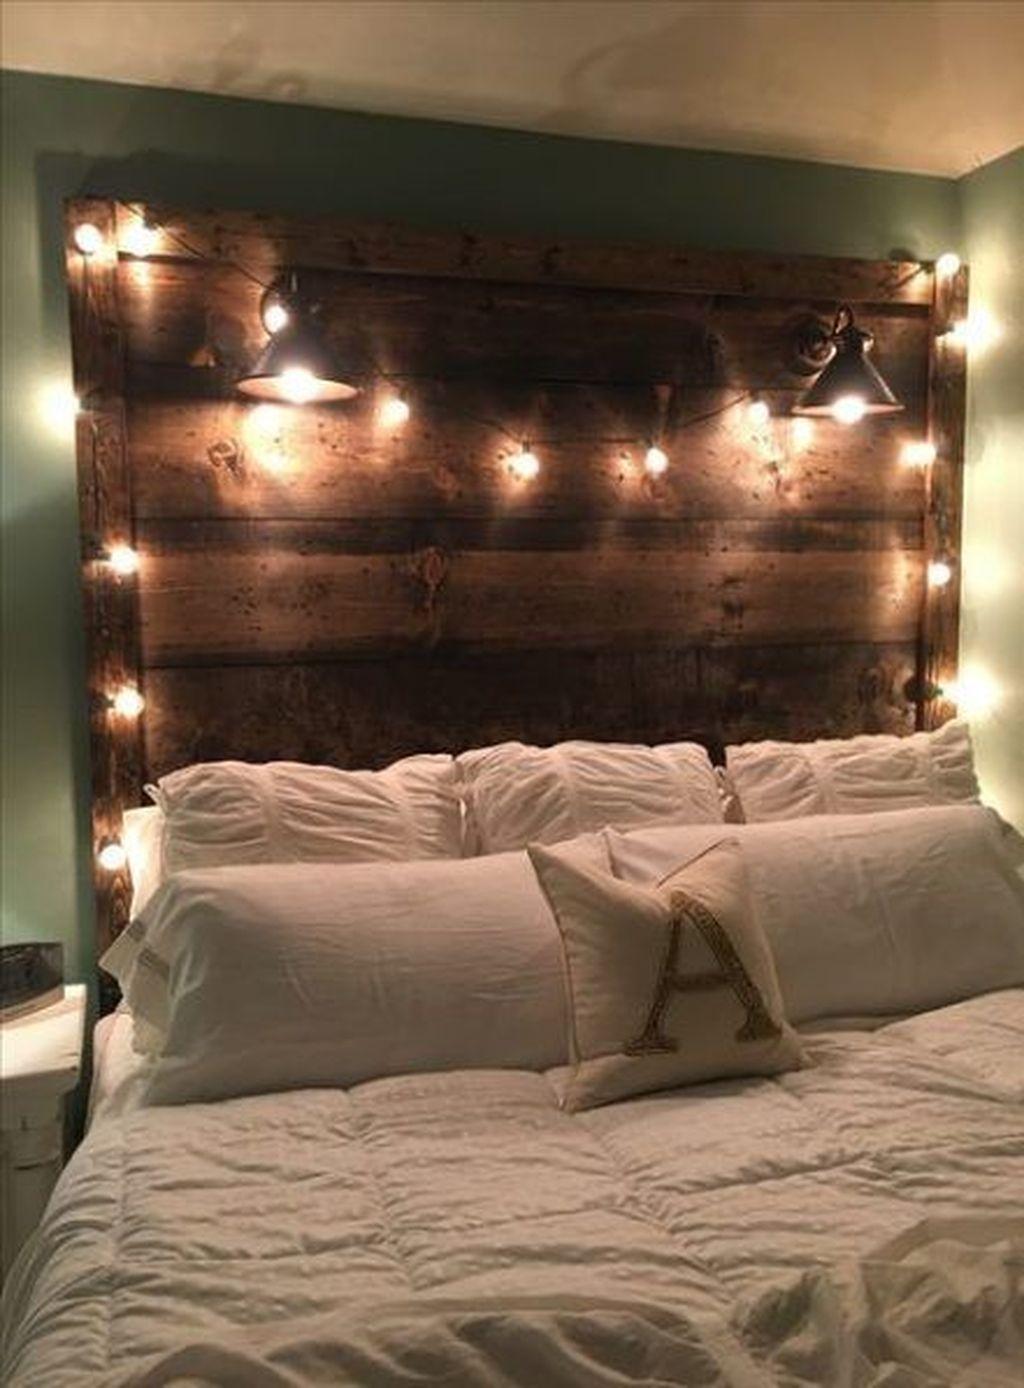 Stylish Diy Bedroom Headboard Design Ideas That Will Inspire You 19